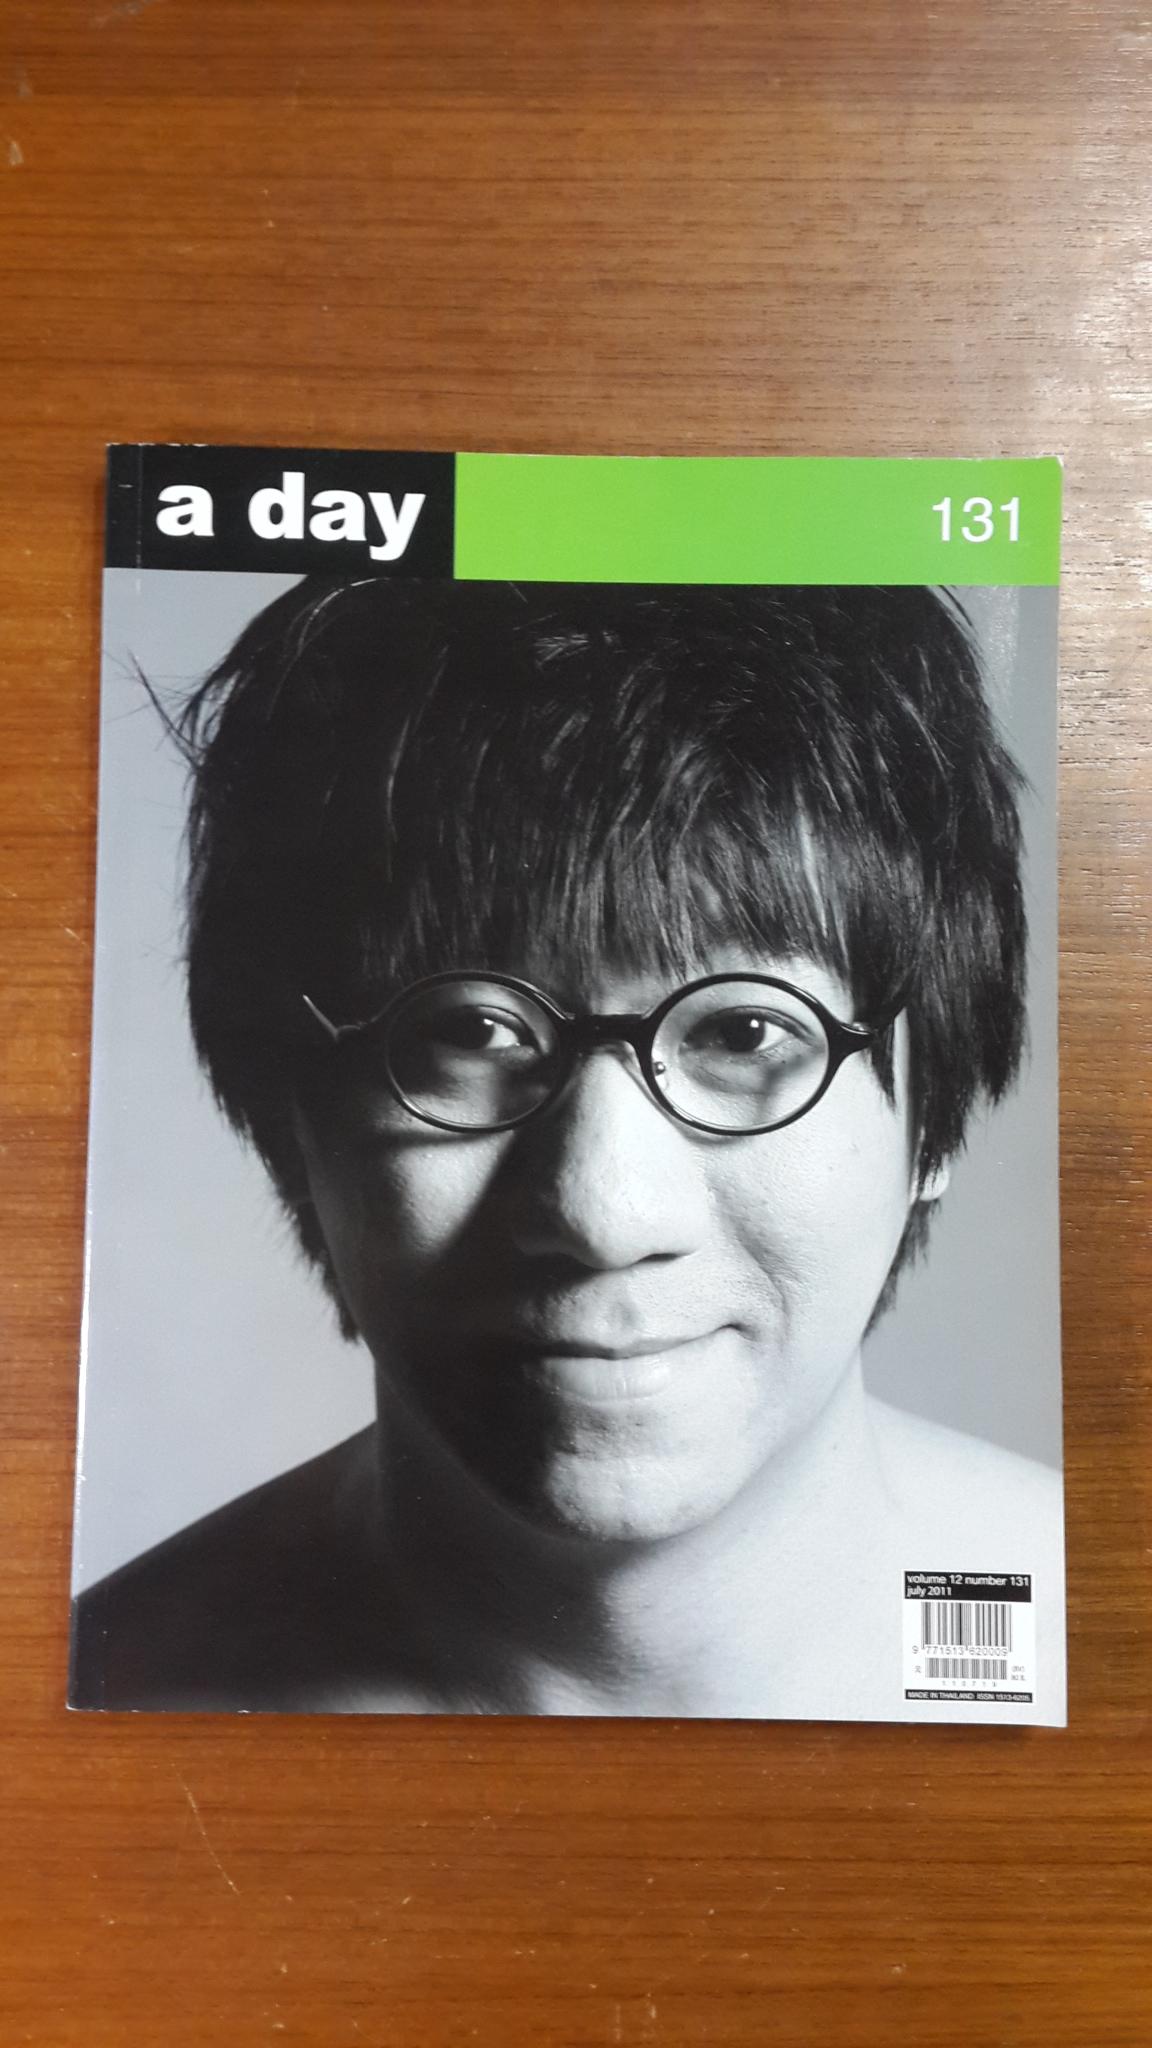 a day : ฉบับที่ 131